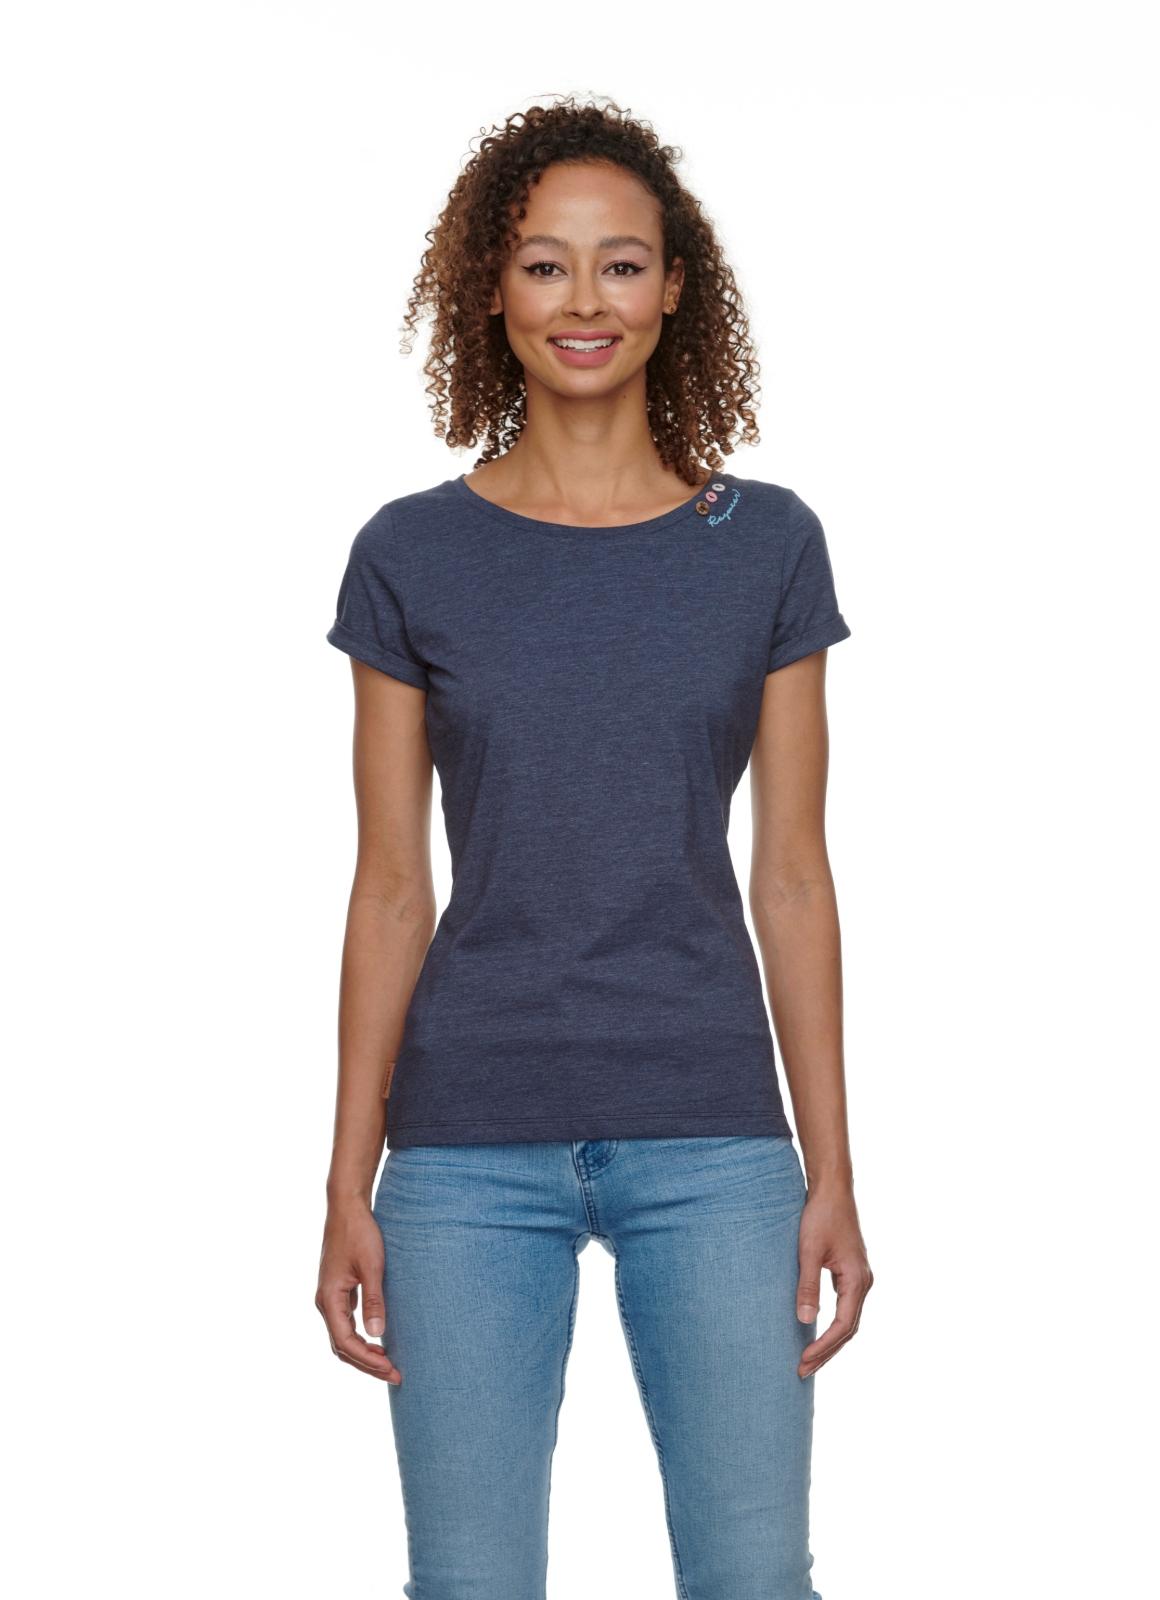 Ragwear Damen T-Shirt Florah a Organic blau unifarben 2111 10049 2028 navy